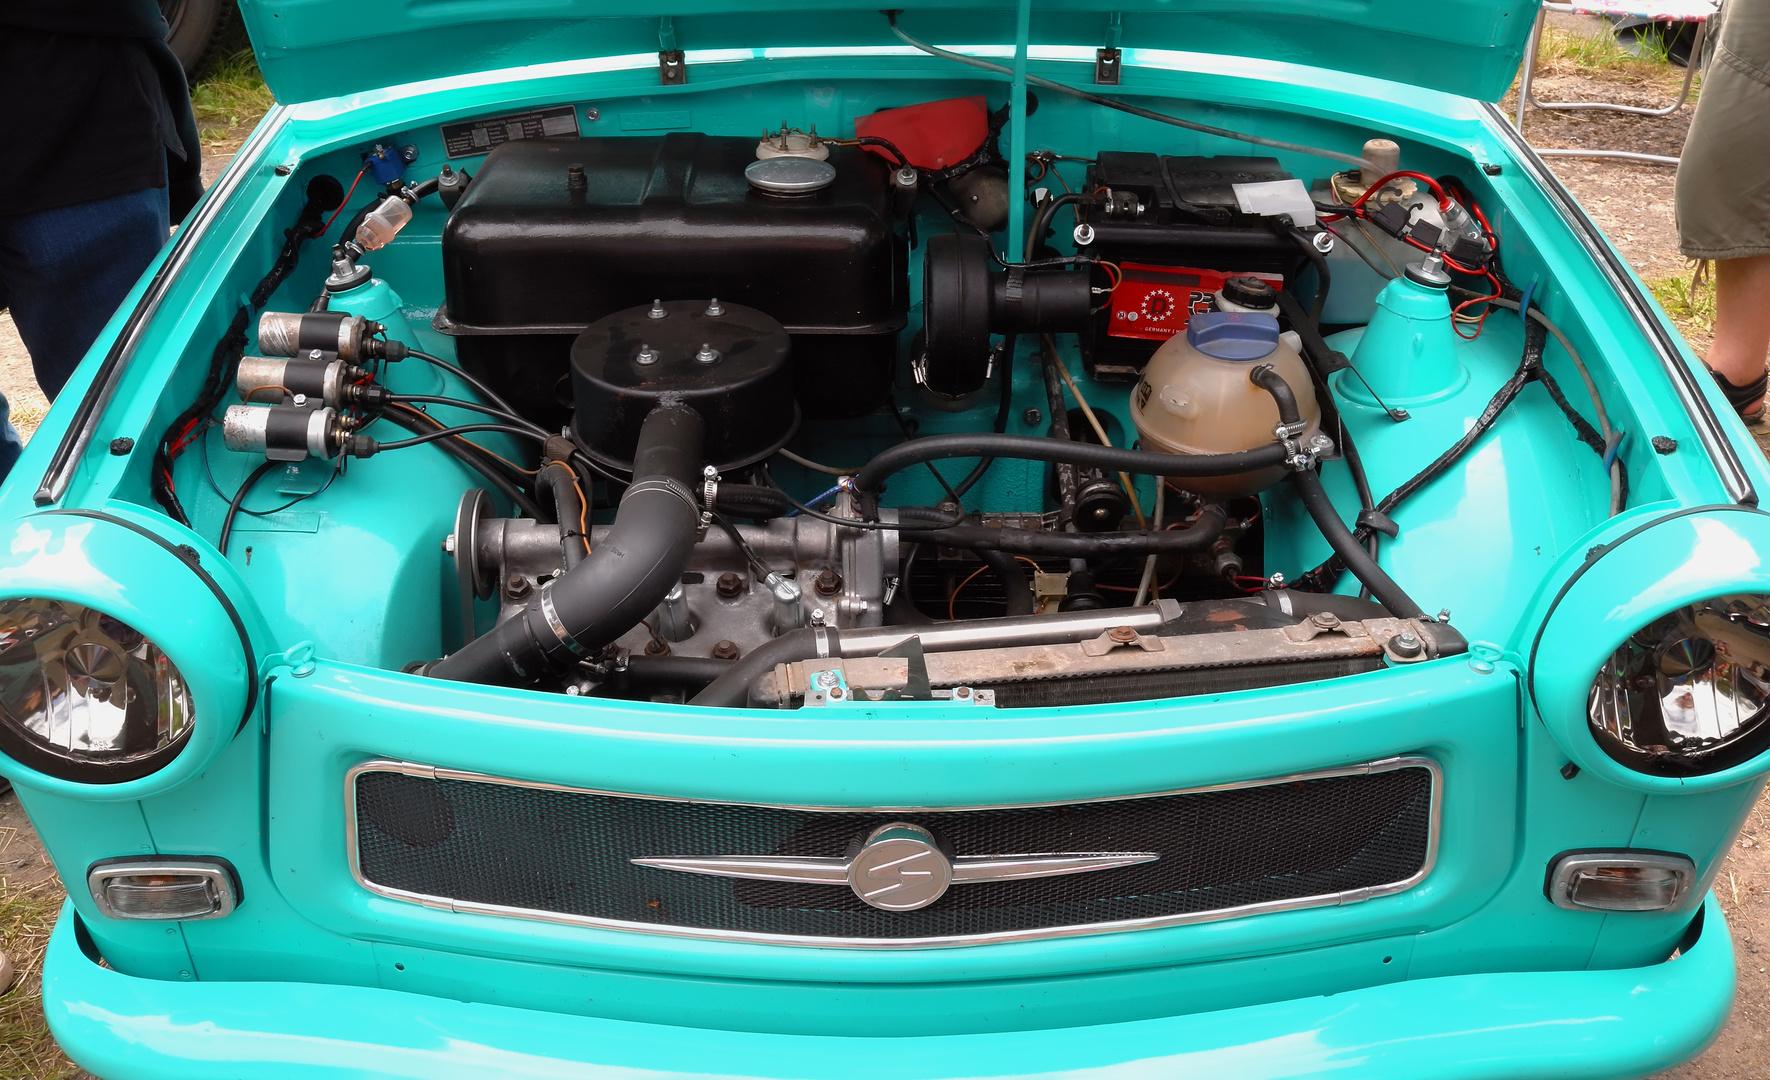 trabant 601 mit wartburg motor eine echte innovation. Black Bedroom Furniture Sets. Home Design Ideas